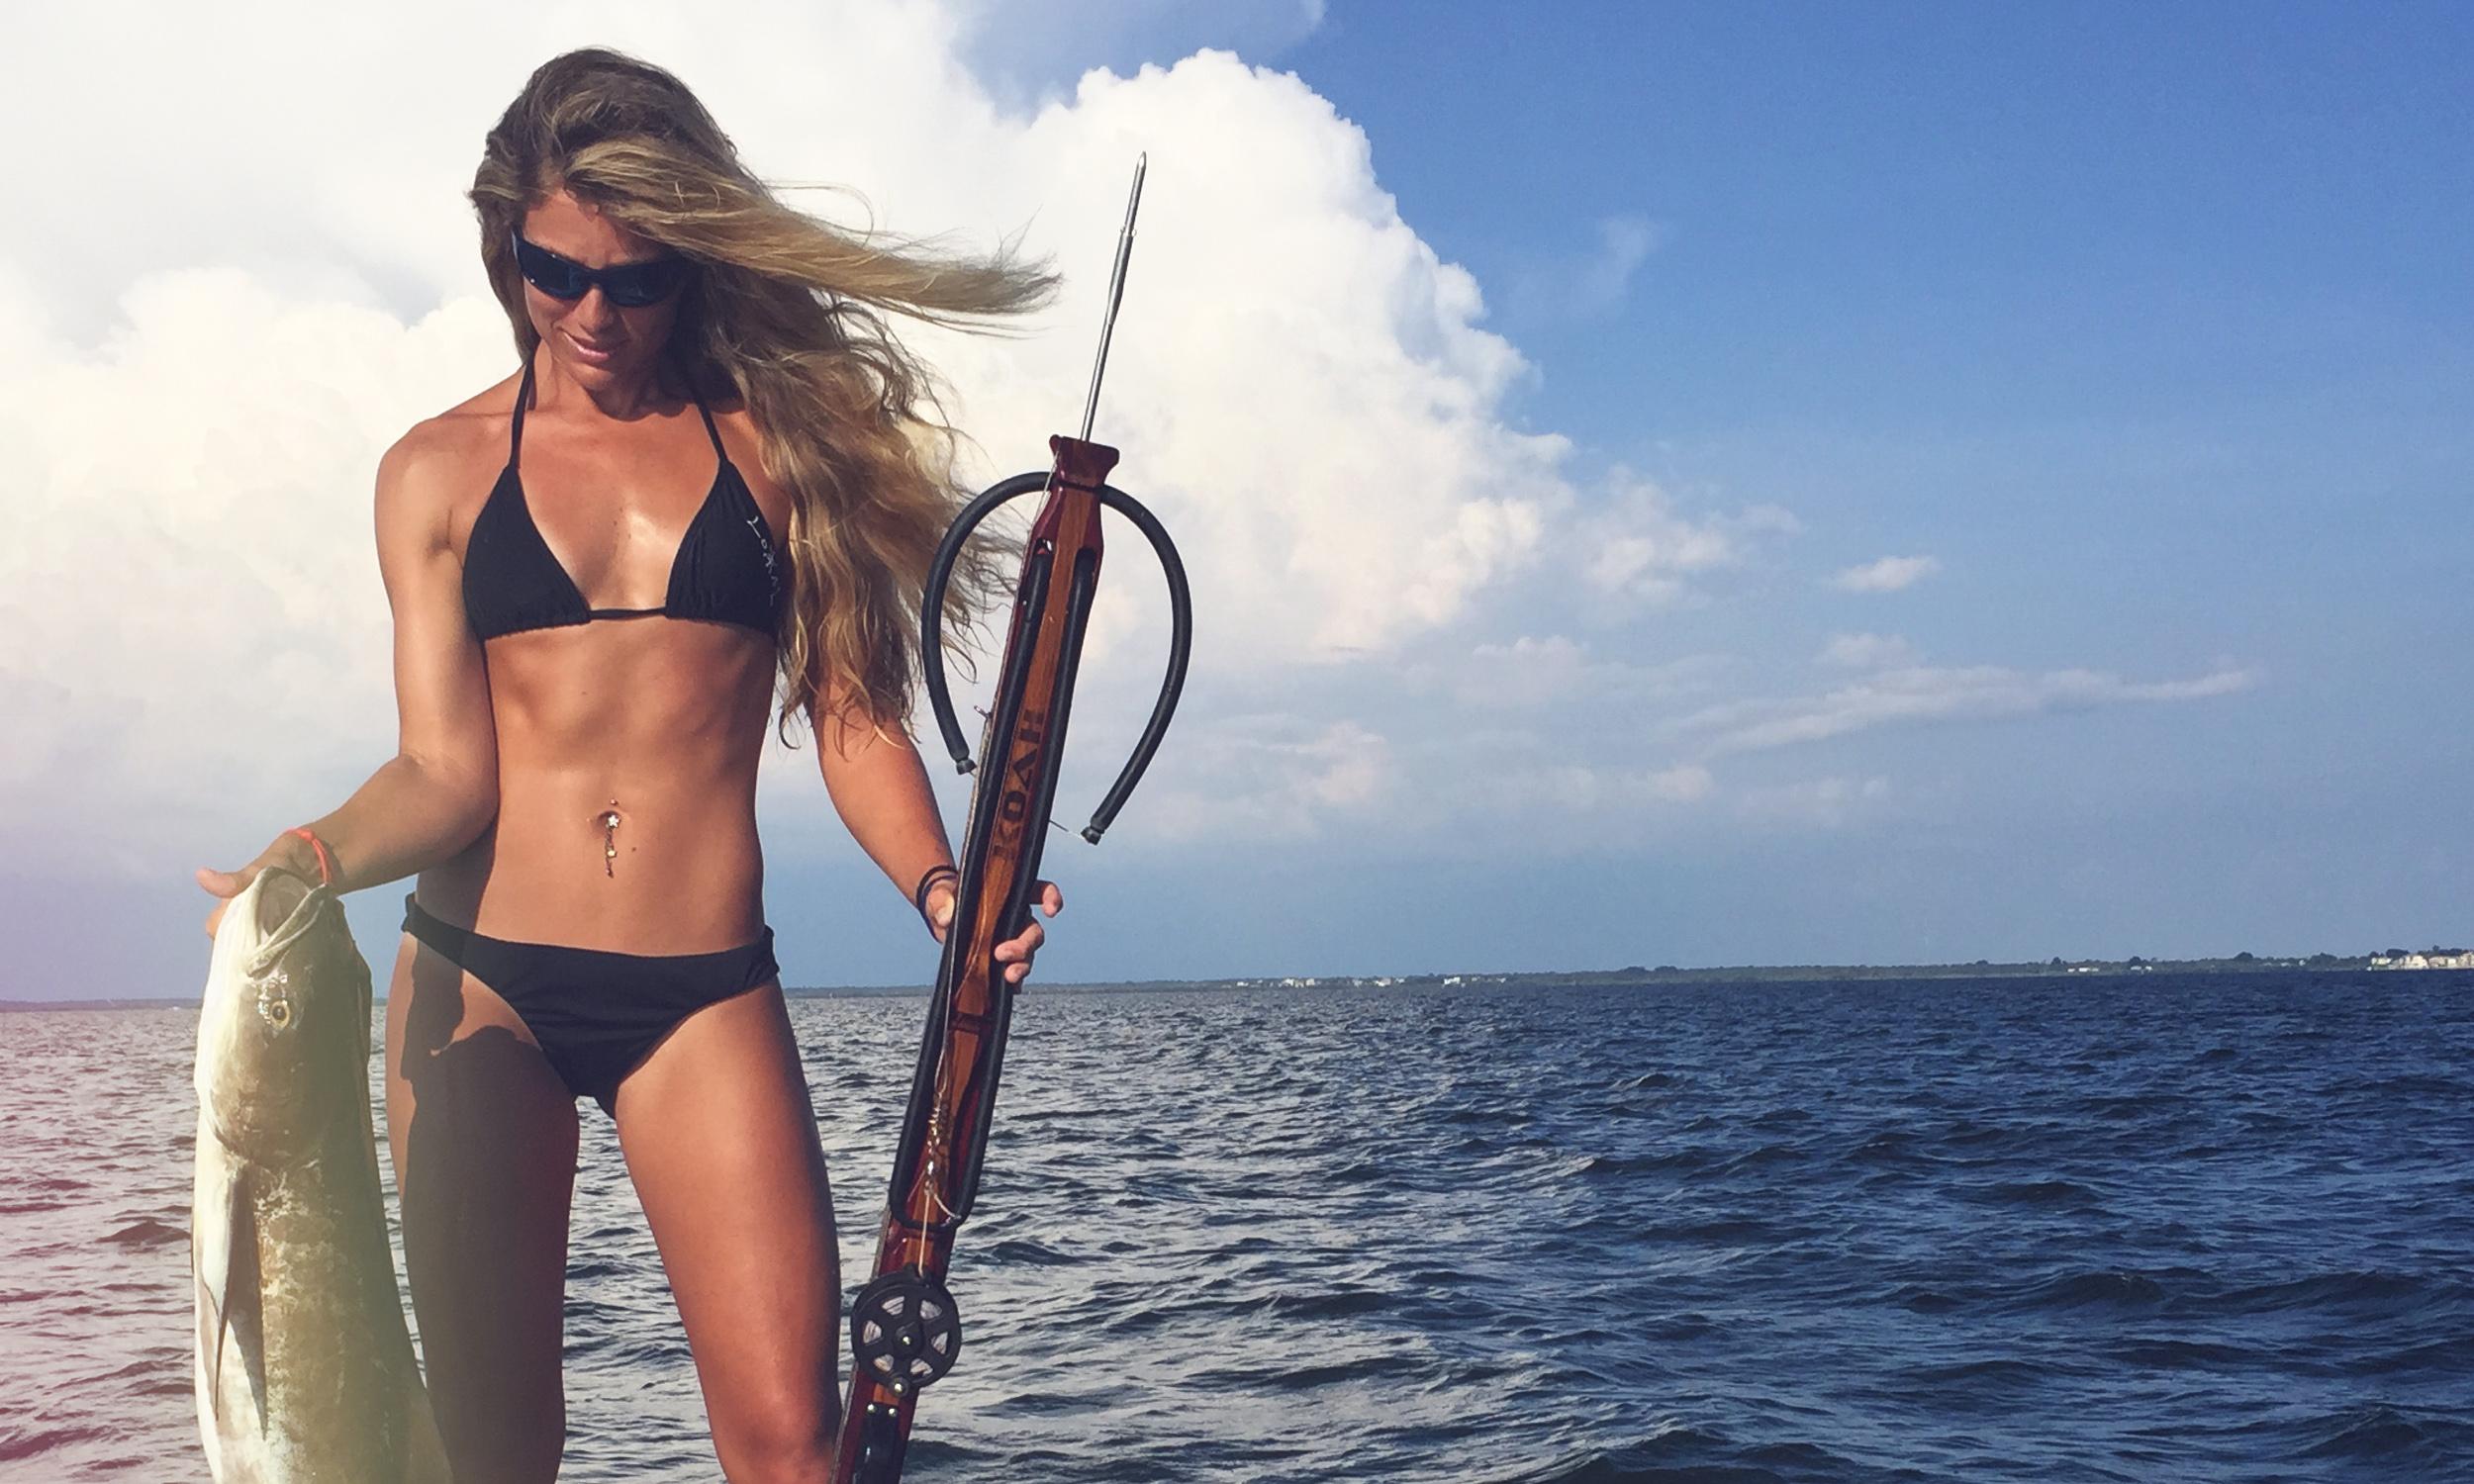 Bikini Fishing Videos photo 11